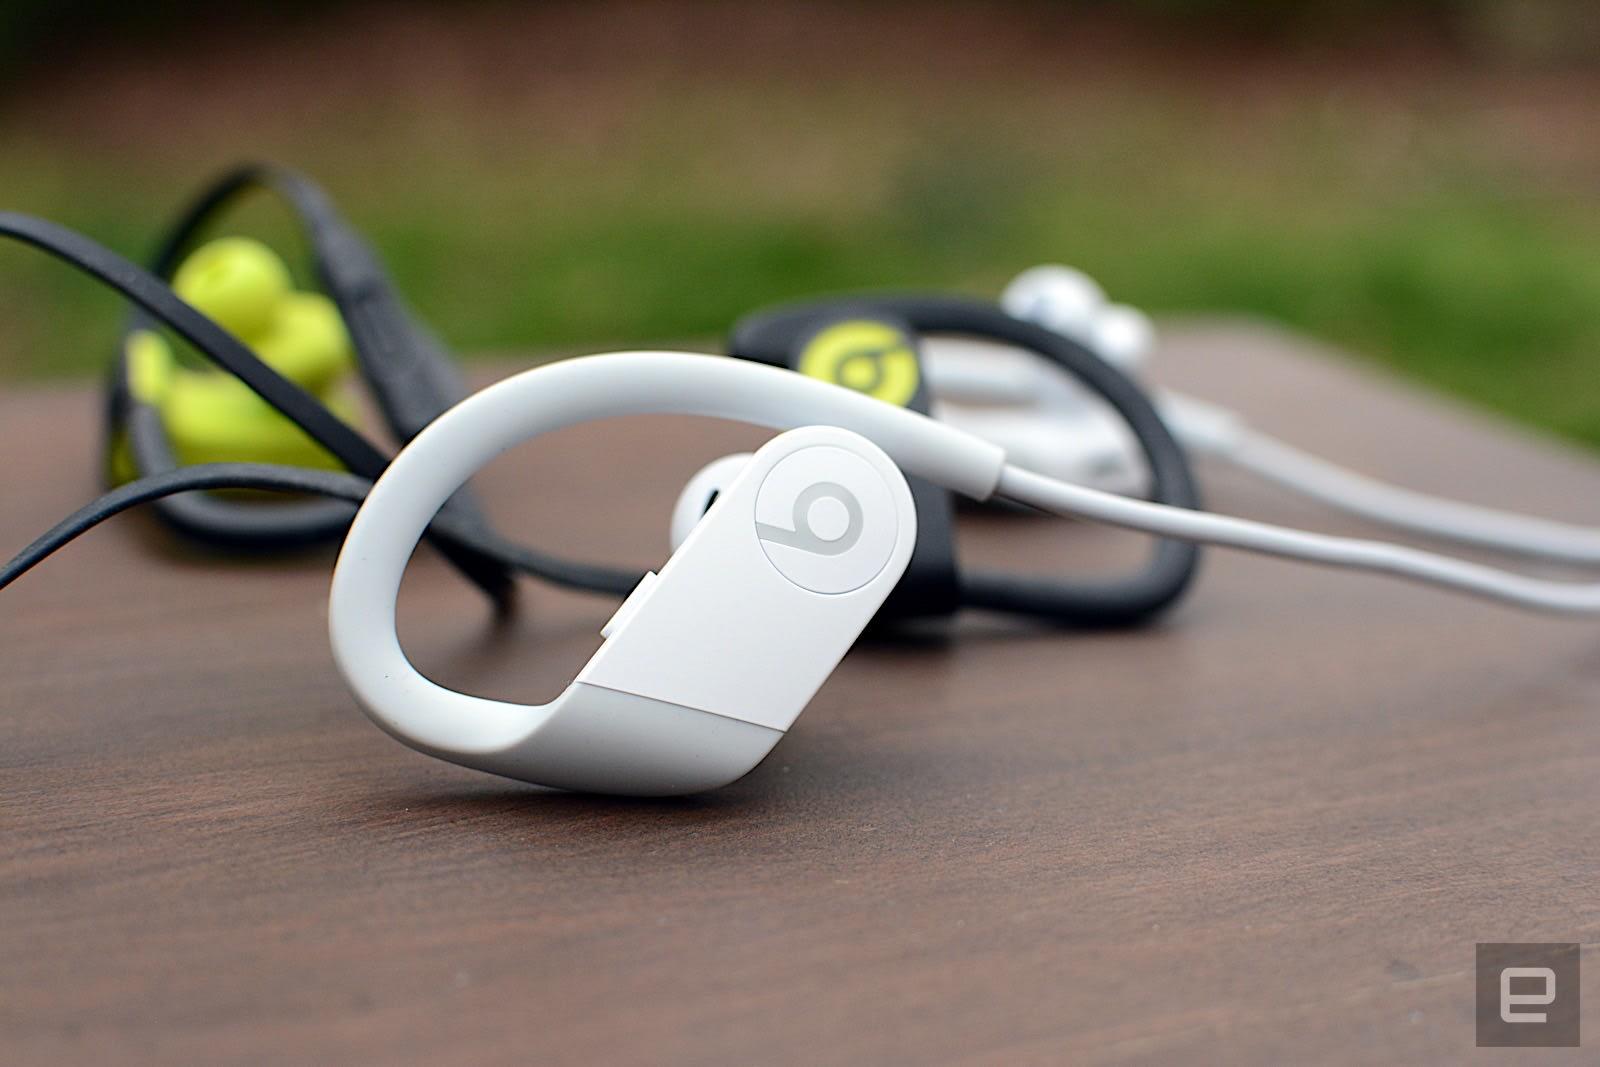 Beats Powerbeats review